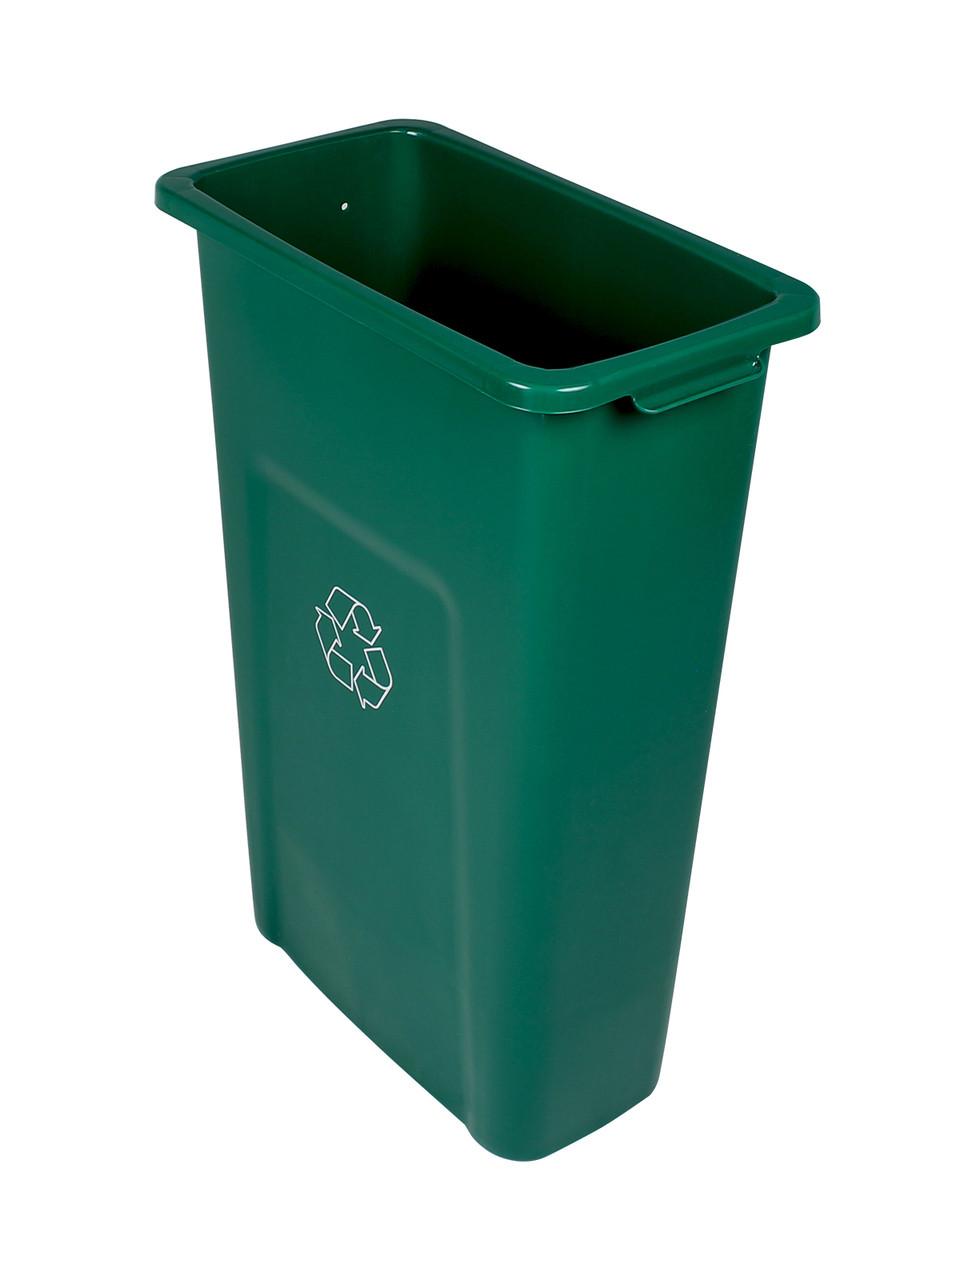 20 Gallon Skinny Plastic Home & Office Recycling Bin Green